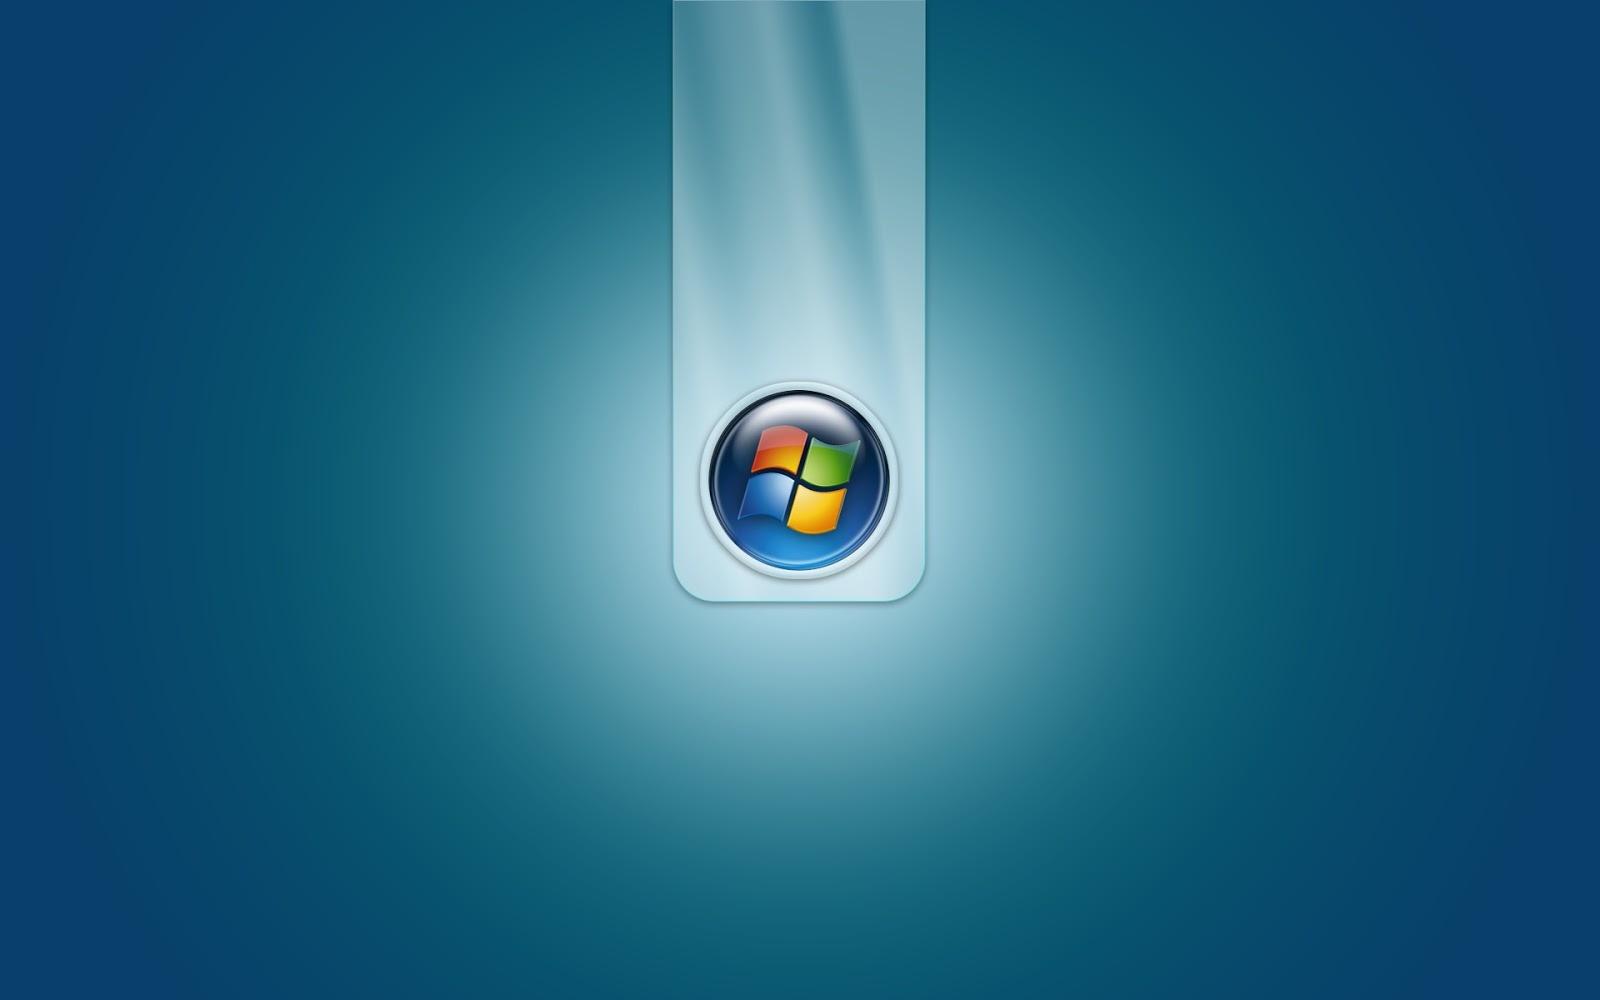 Windows Vista HD Wallpaper - WallpaperSafari